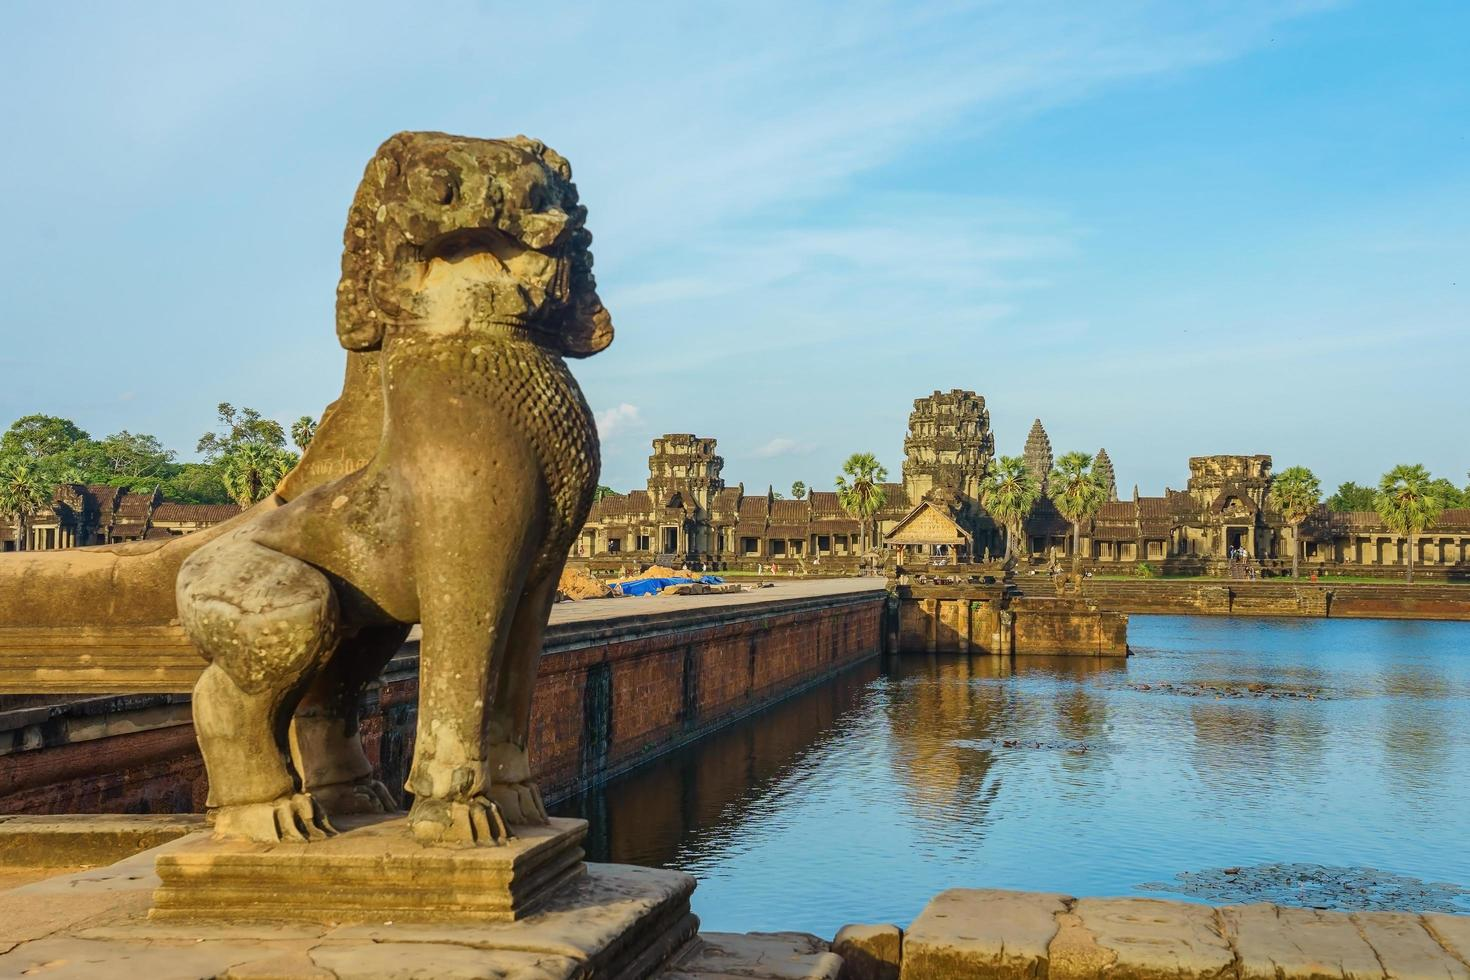 alter Tempel Angkor Wat von jenseits des Sees, Siem Reap, Kambodscha foto